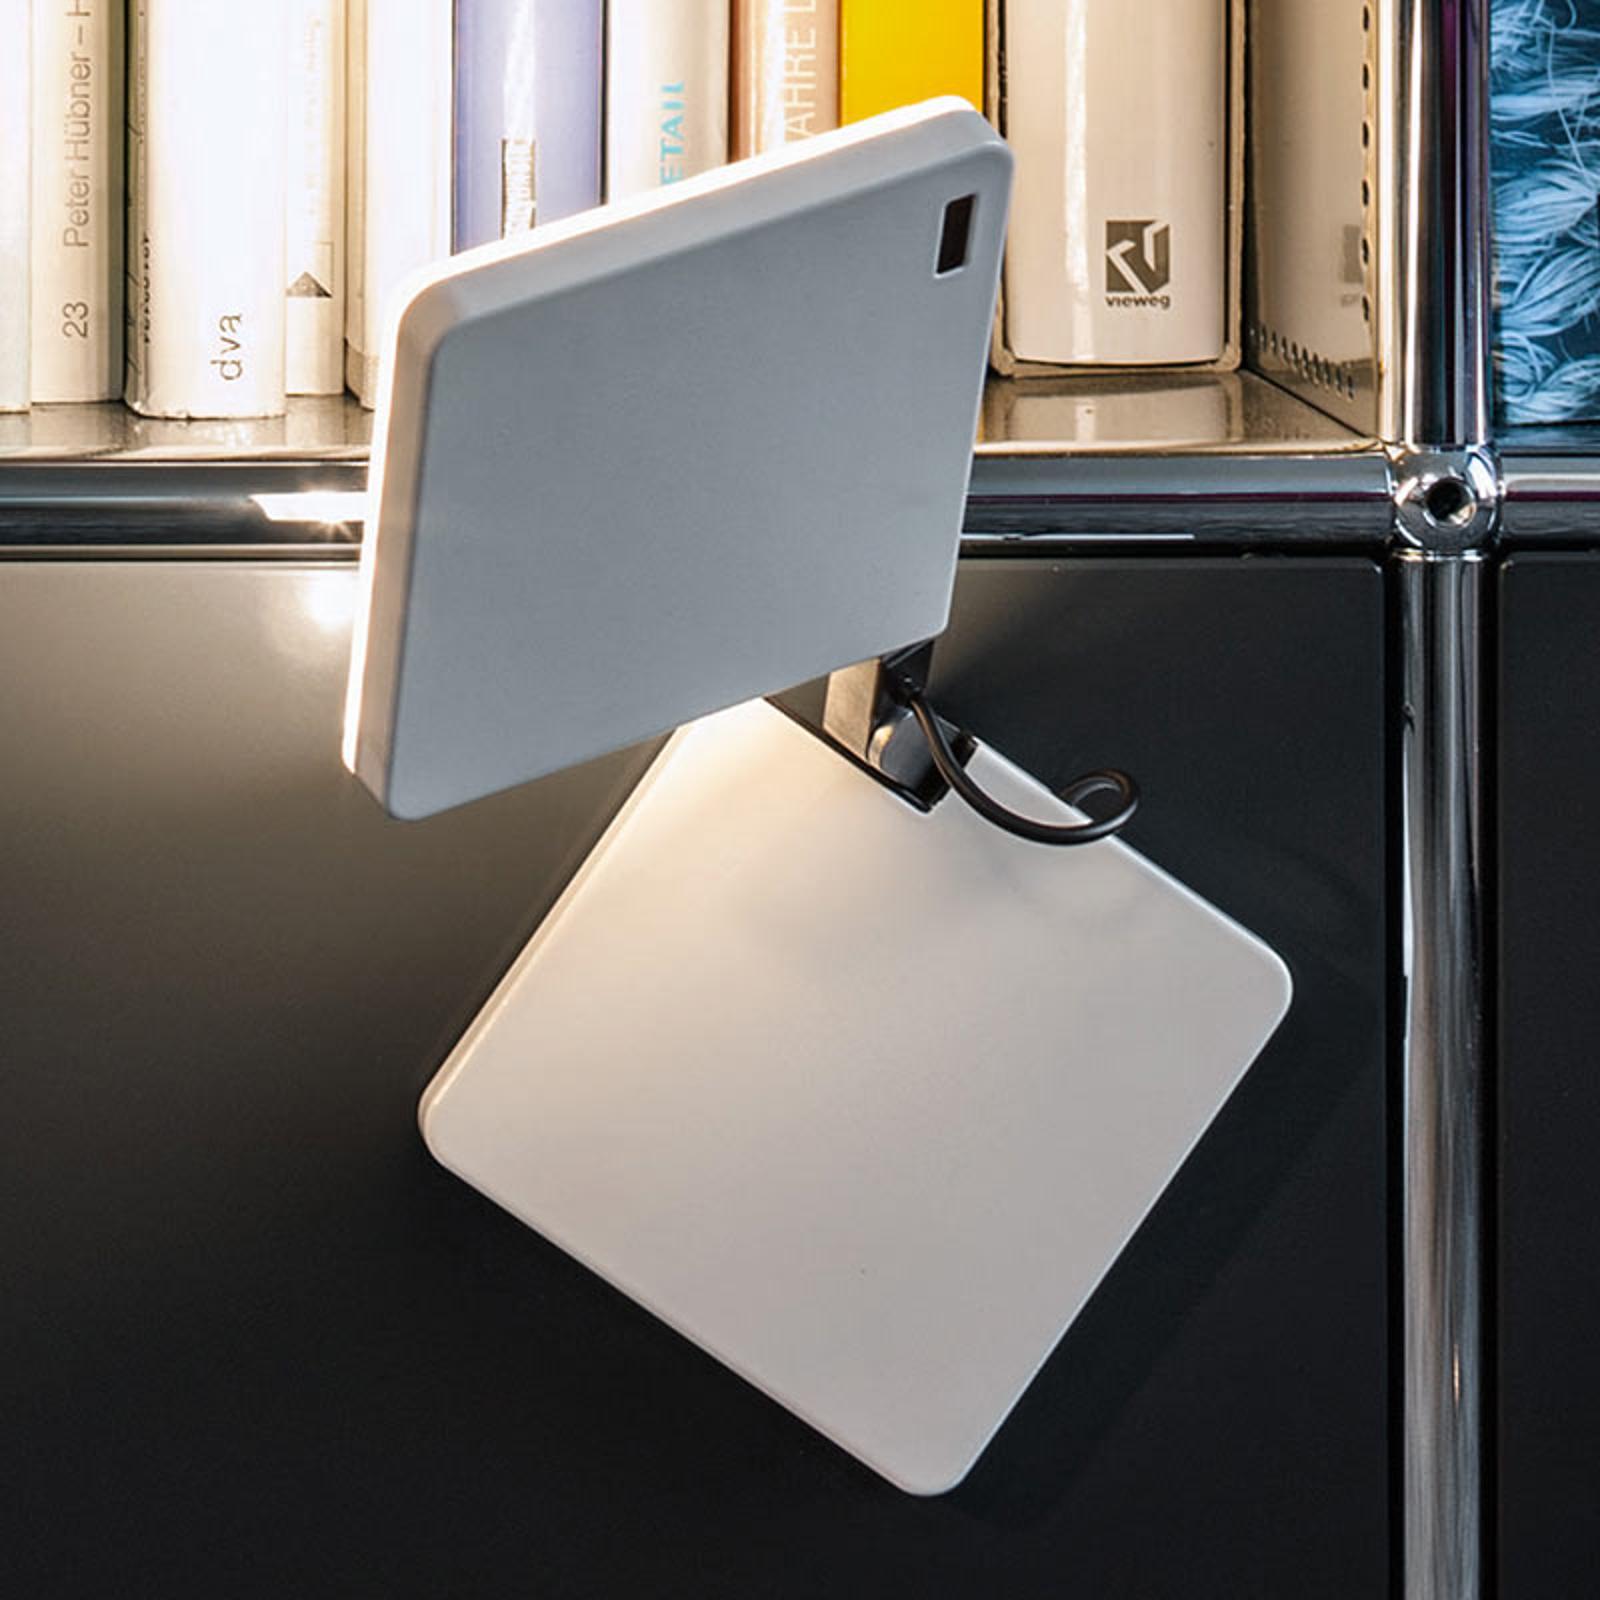 Nimbus Roxxane Fly CL wall mount to screw in_7018051_1